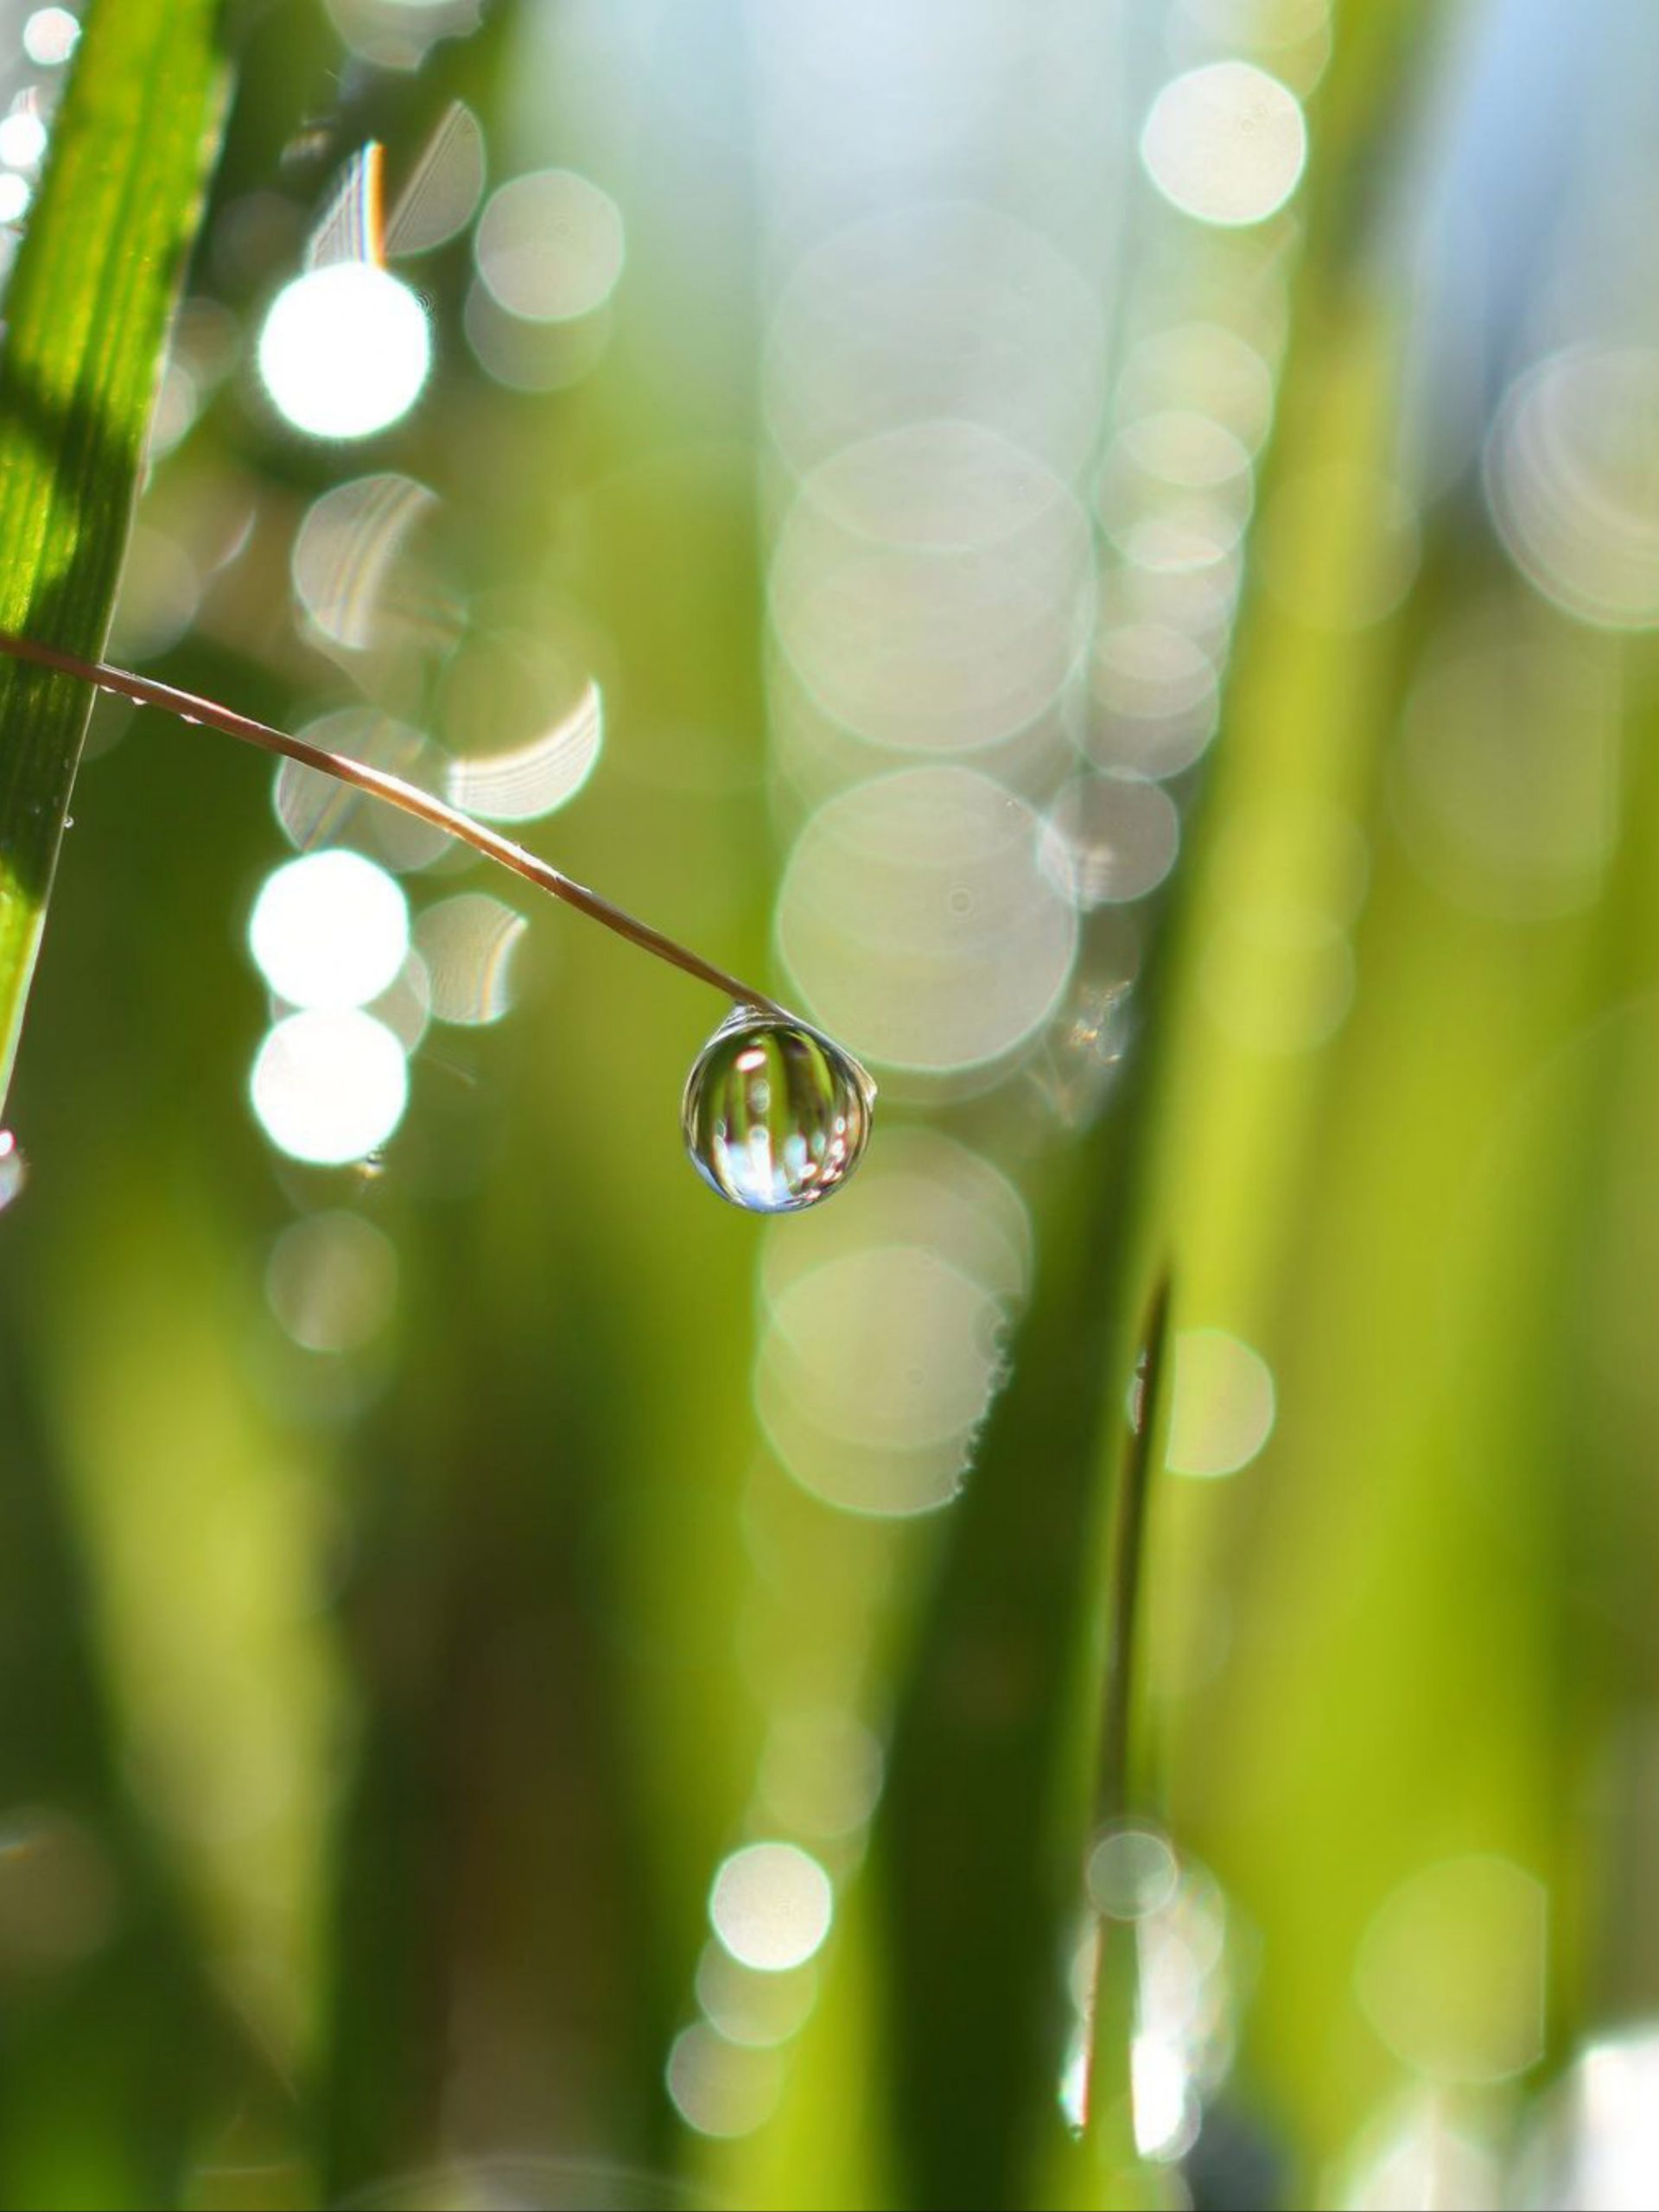 A water drop